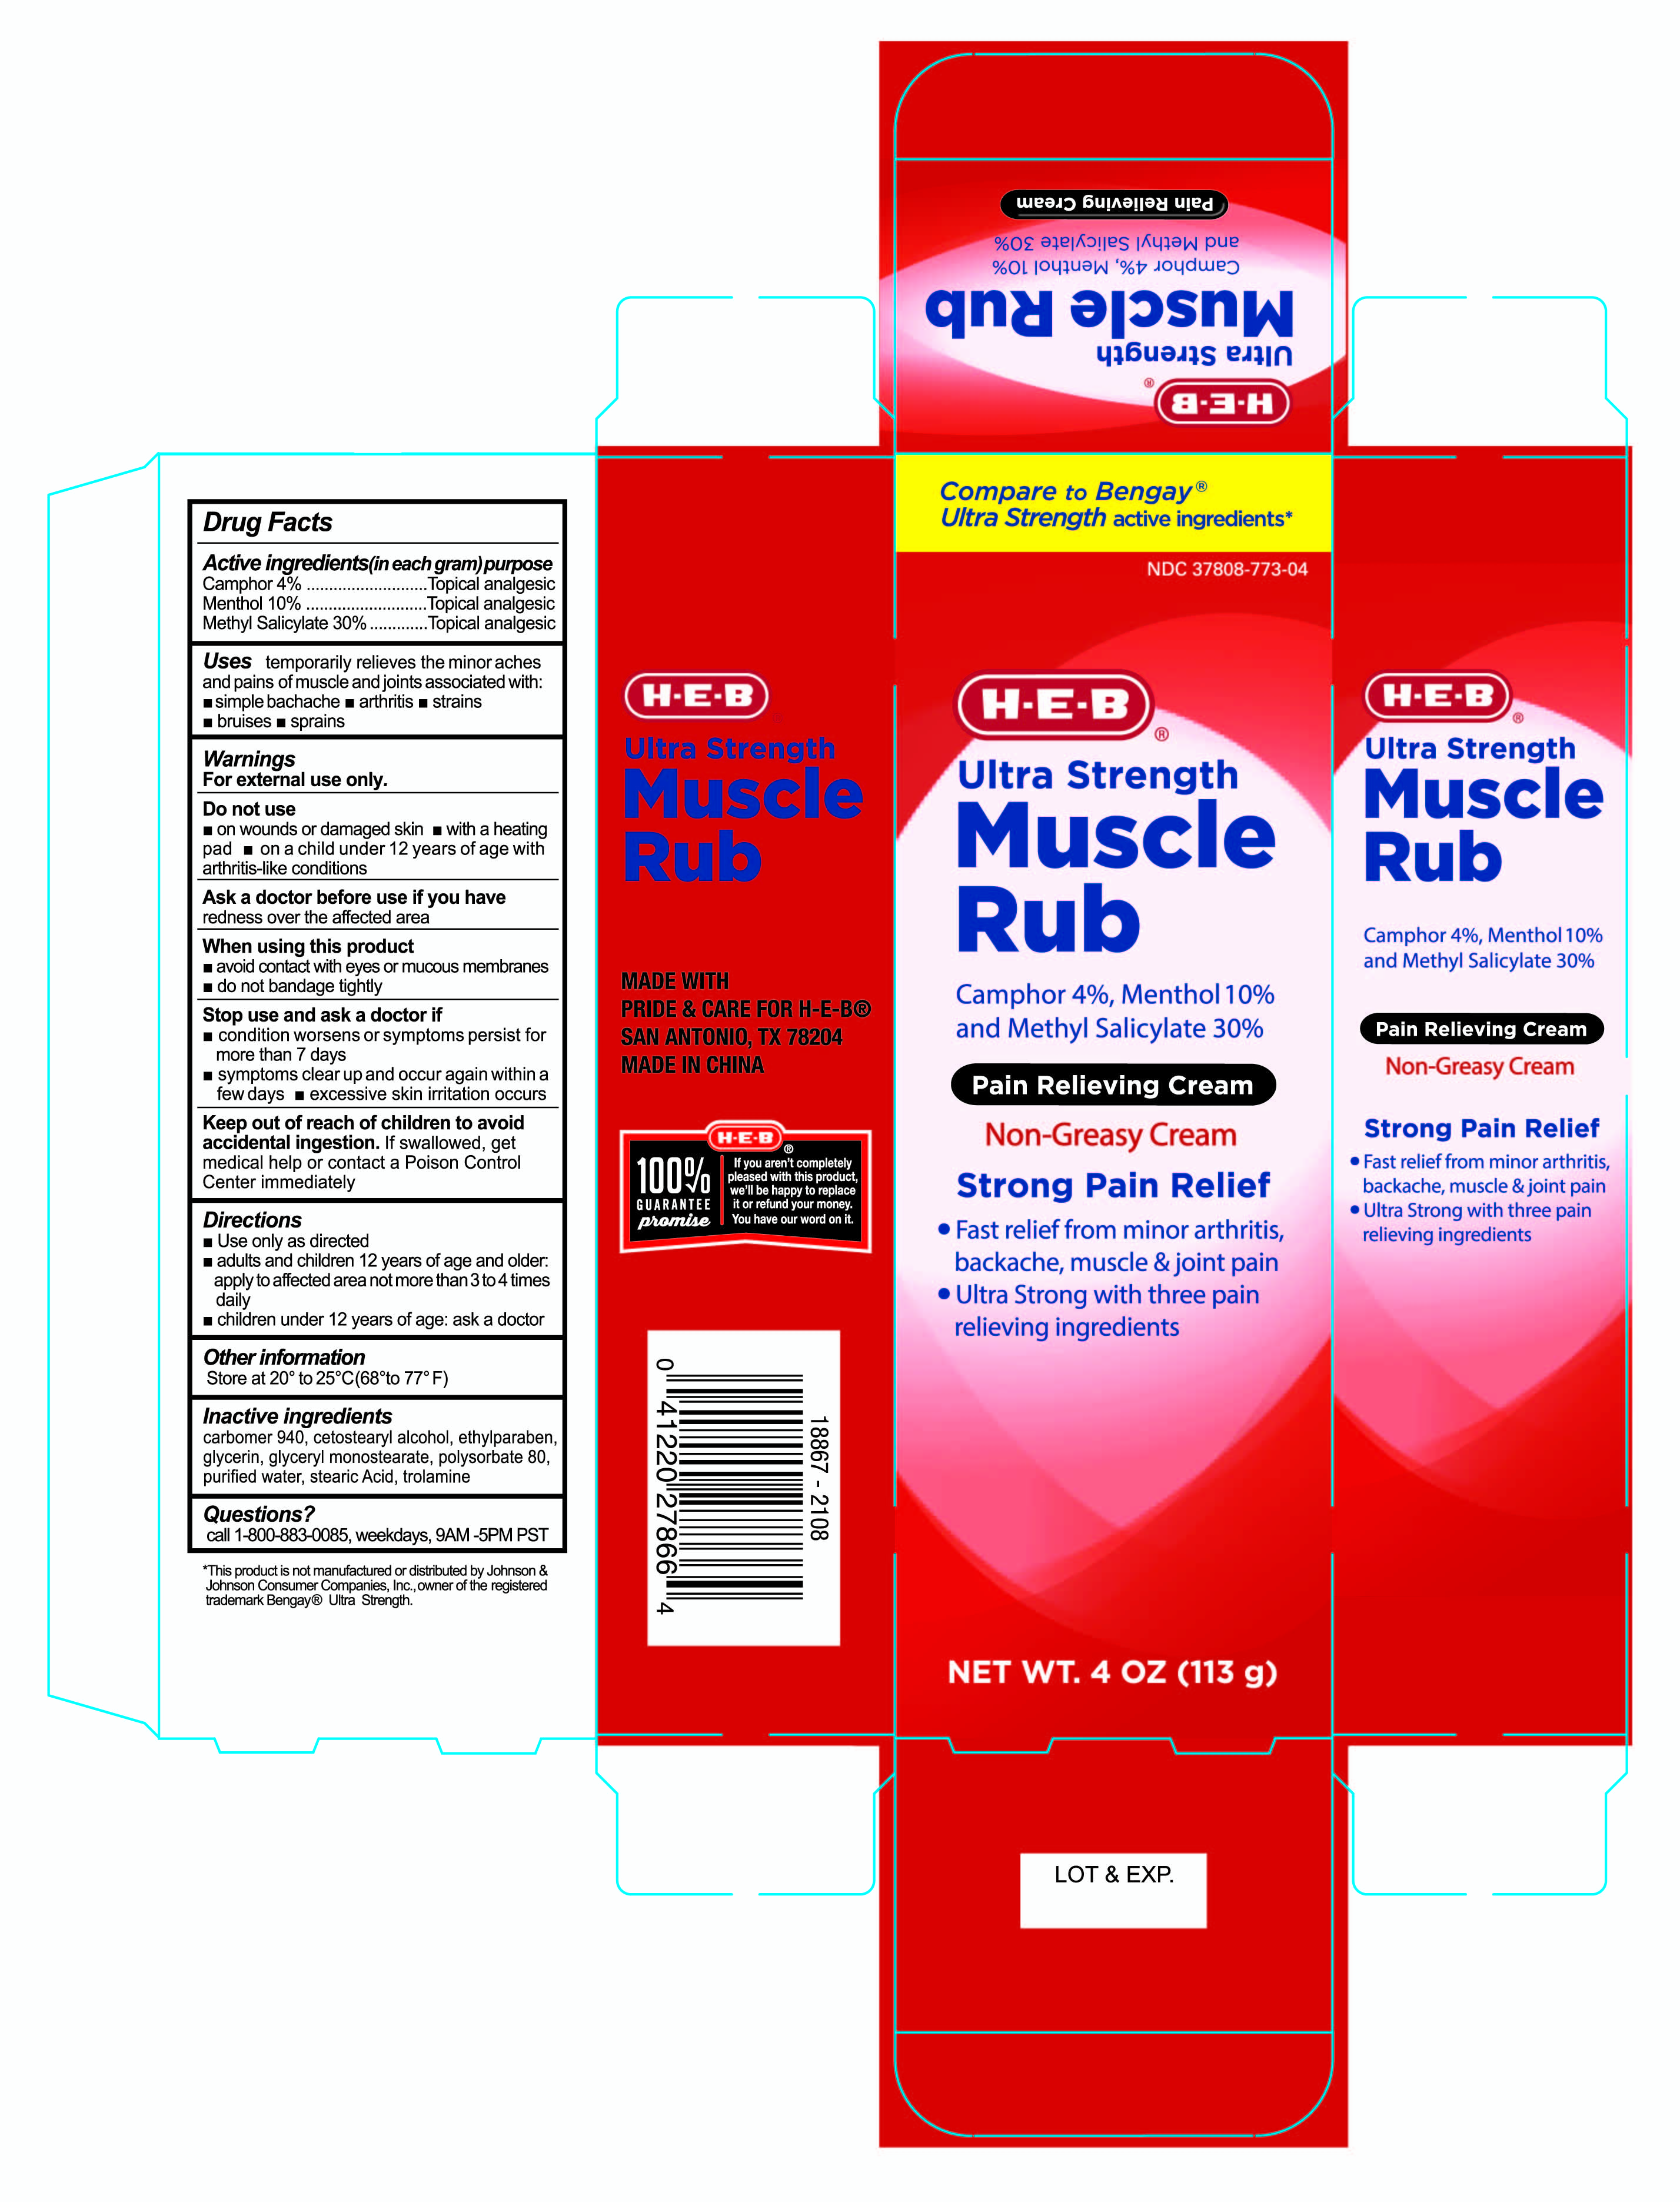 Muscle Rub Ultra (Camphor,menthol, Methyl Salicylate) Cream [H E B]